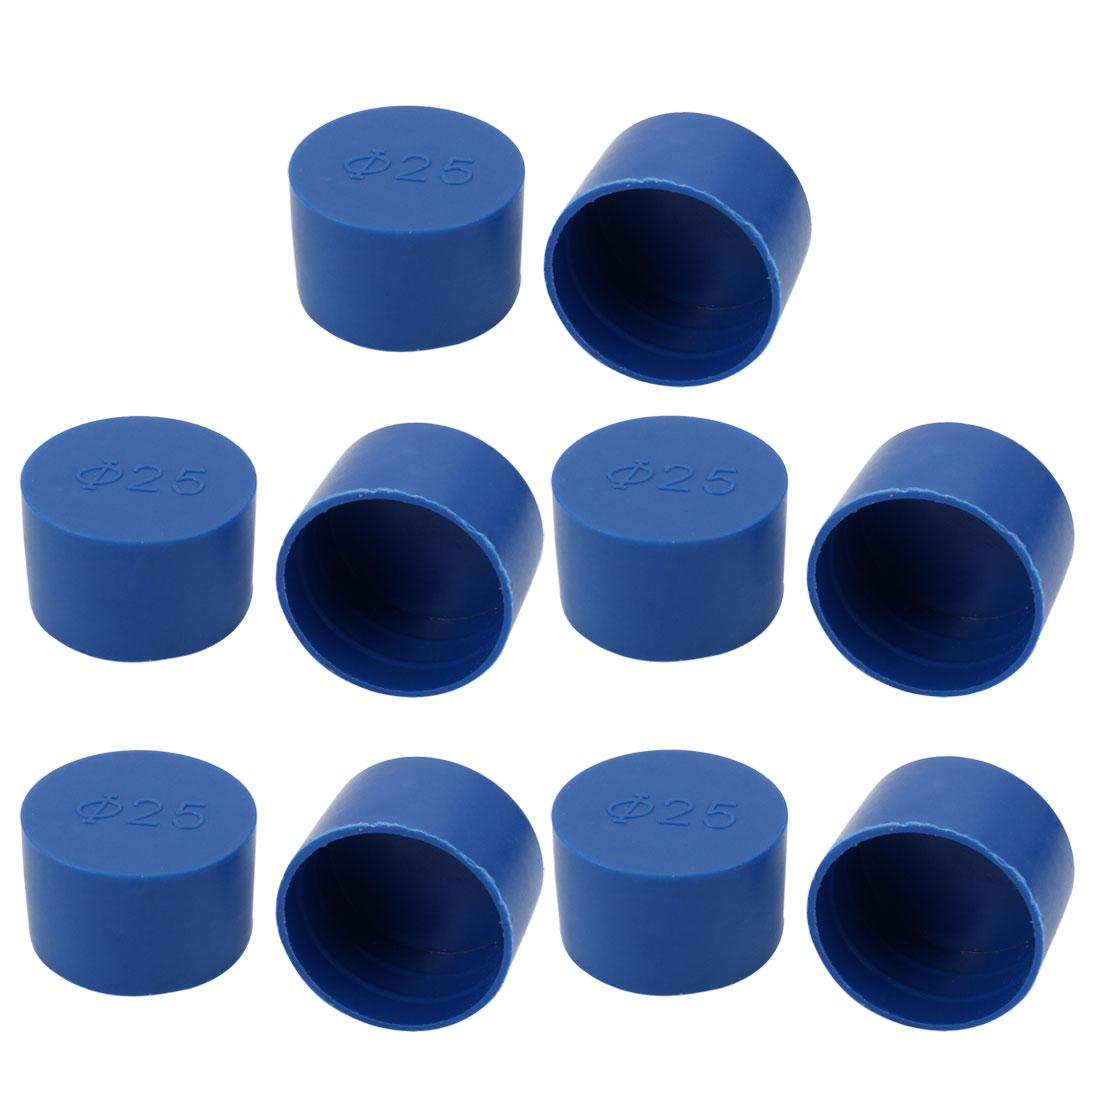 10pcs 25mm Inner Dia PE Plastic End Cap Bolt Thread Protector Tube Cover Blue